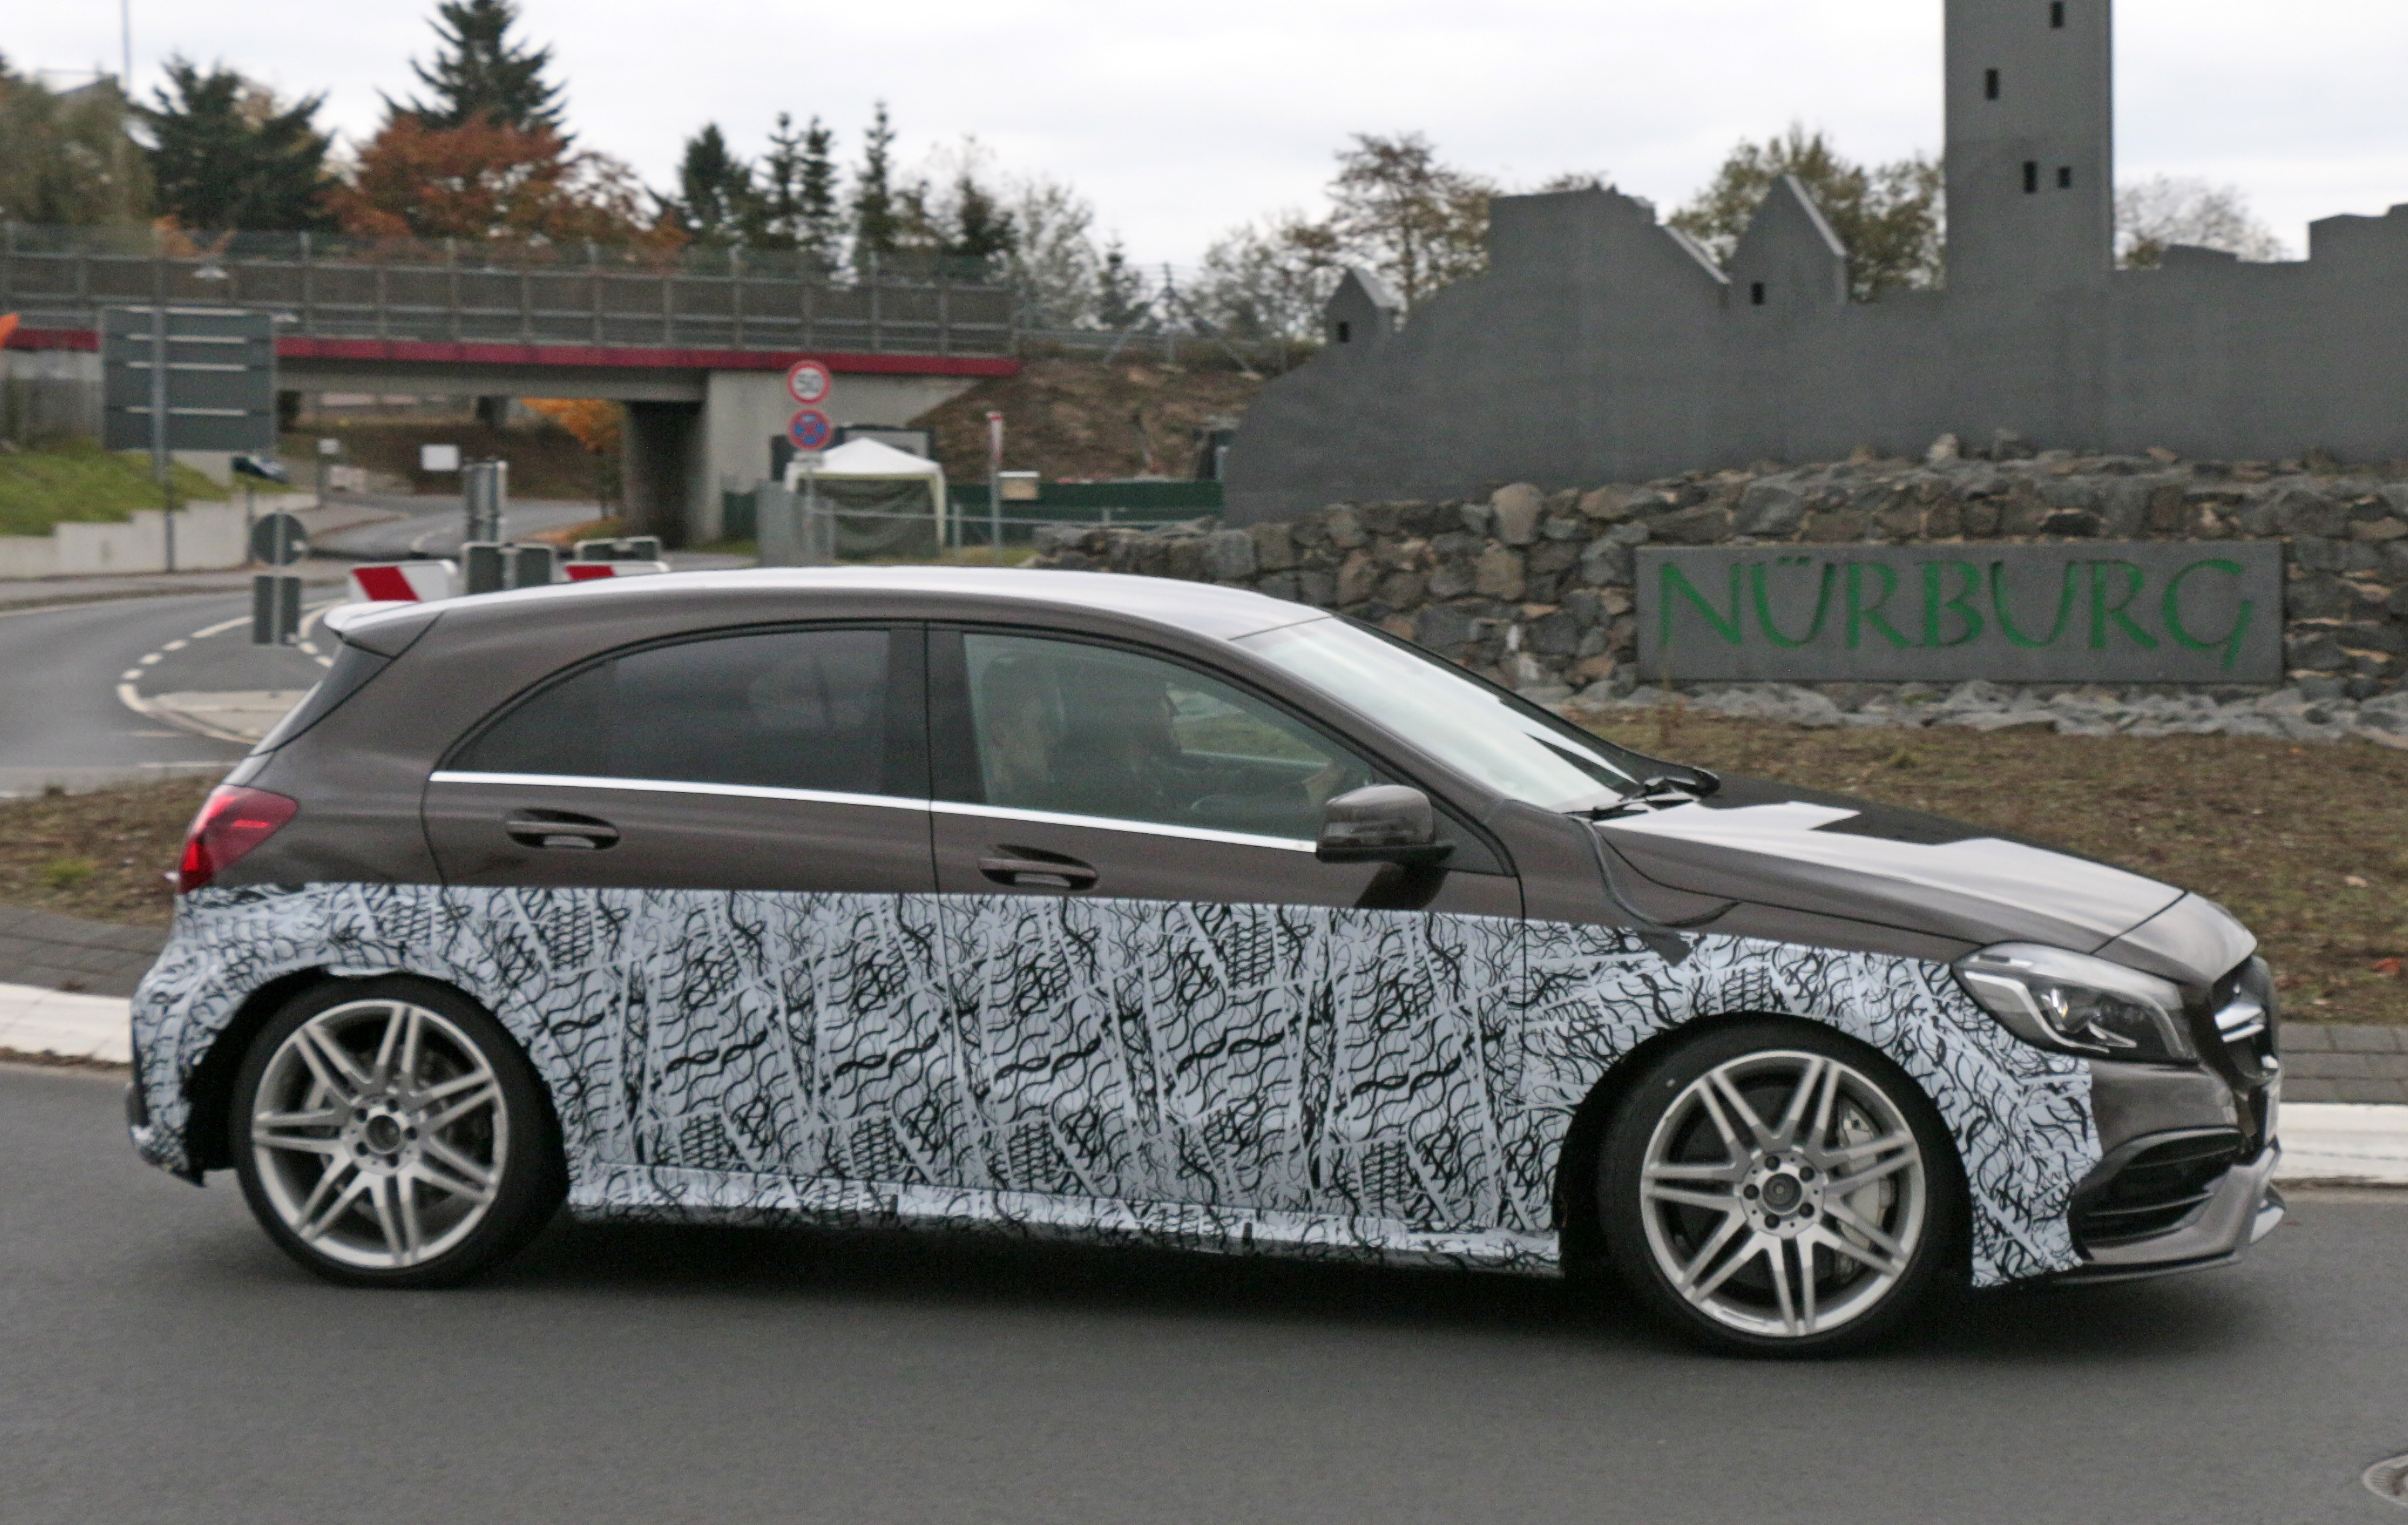 Mercedes Amg Hypercar >> 2019 Mercedes-AMG A45 To Feature Mild-Hybrid Engine ...